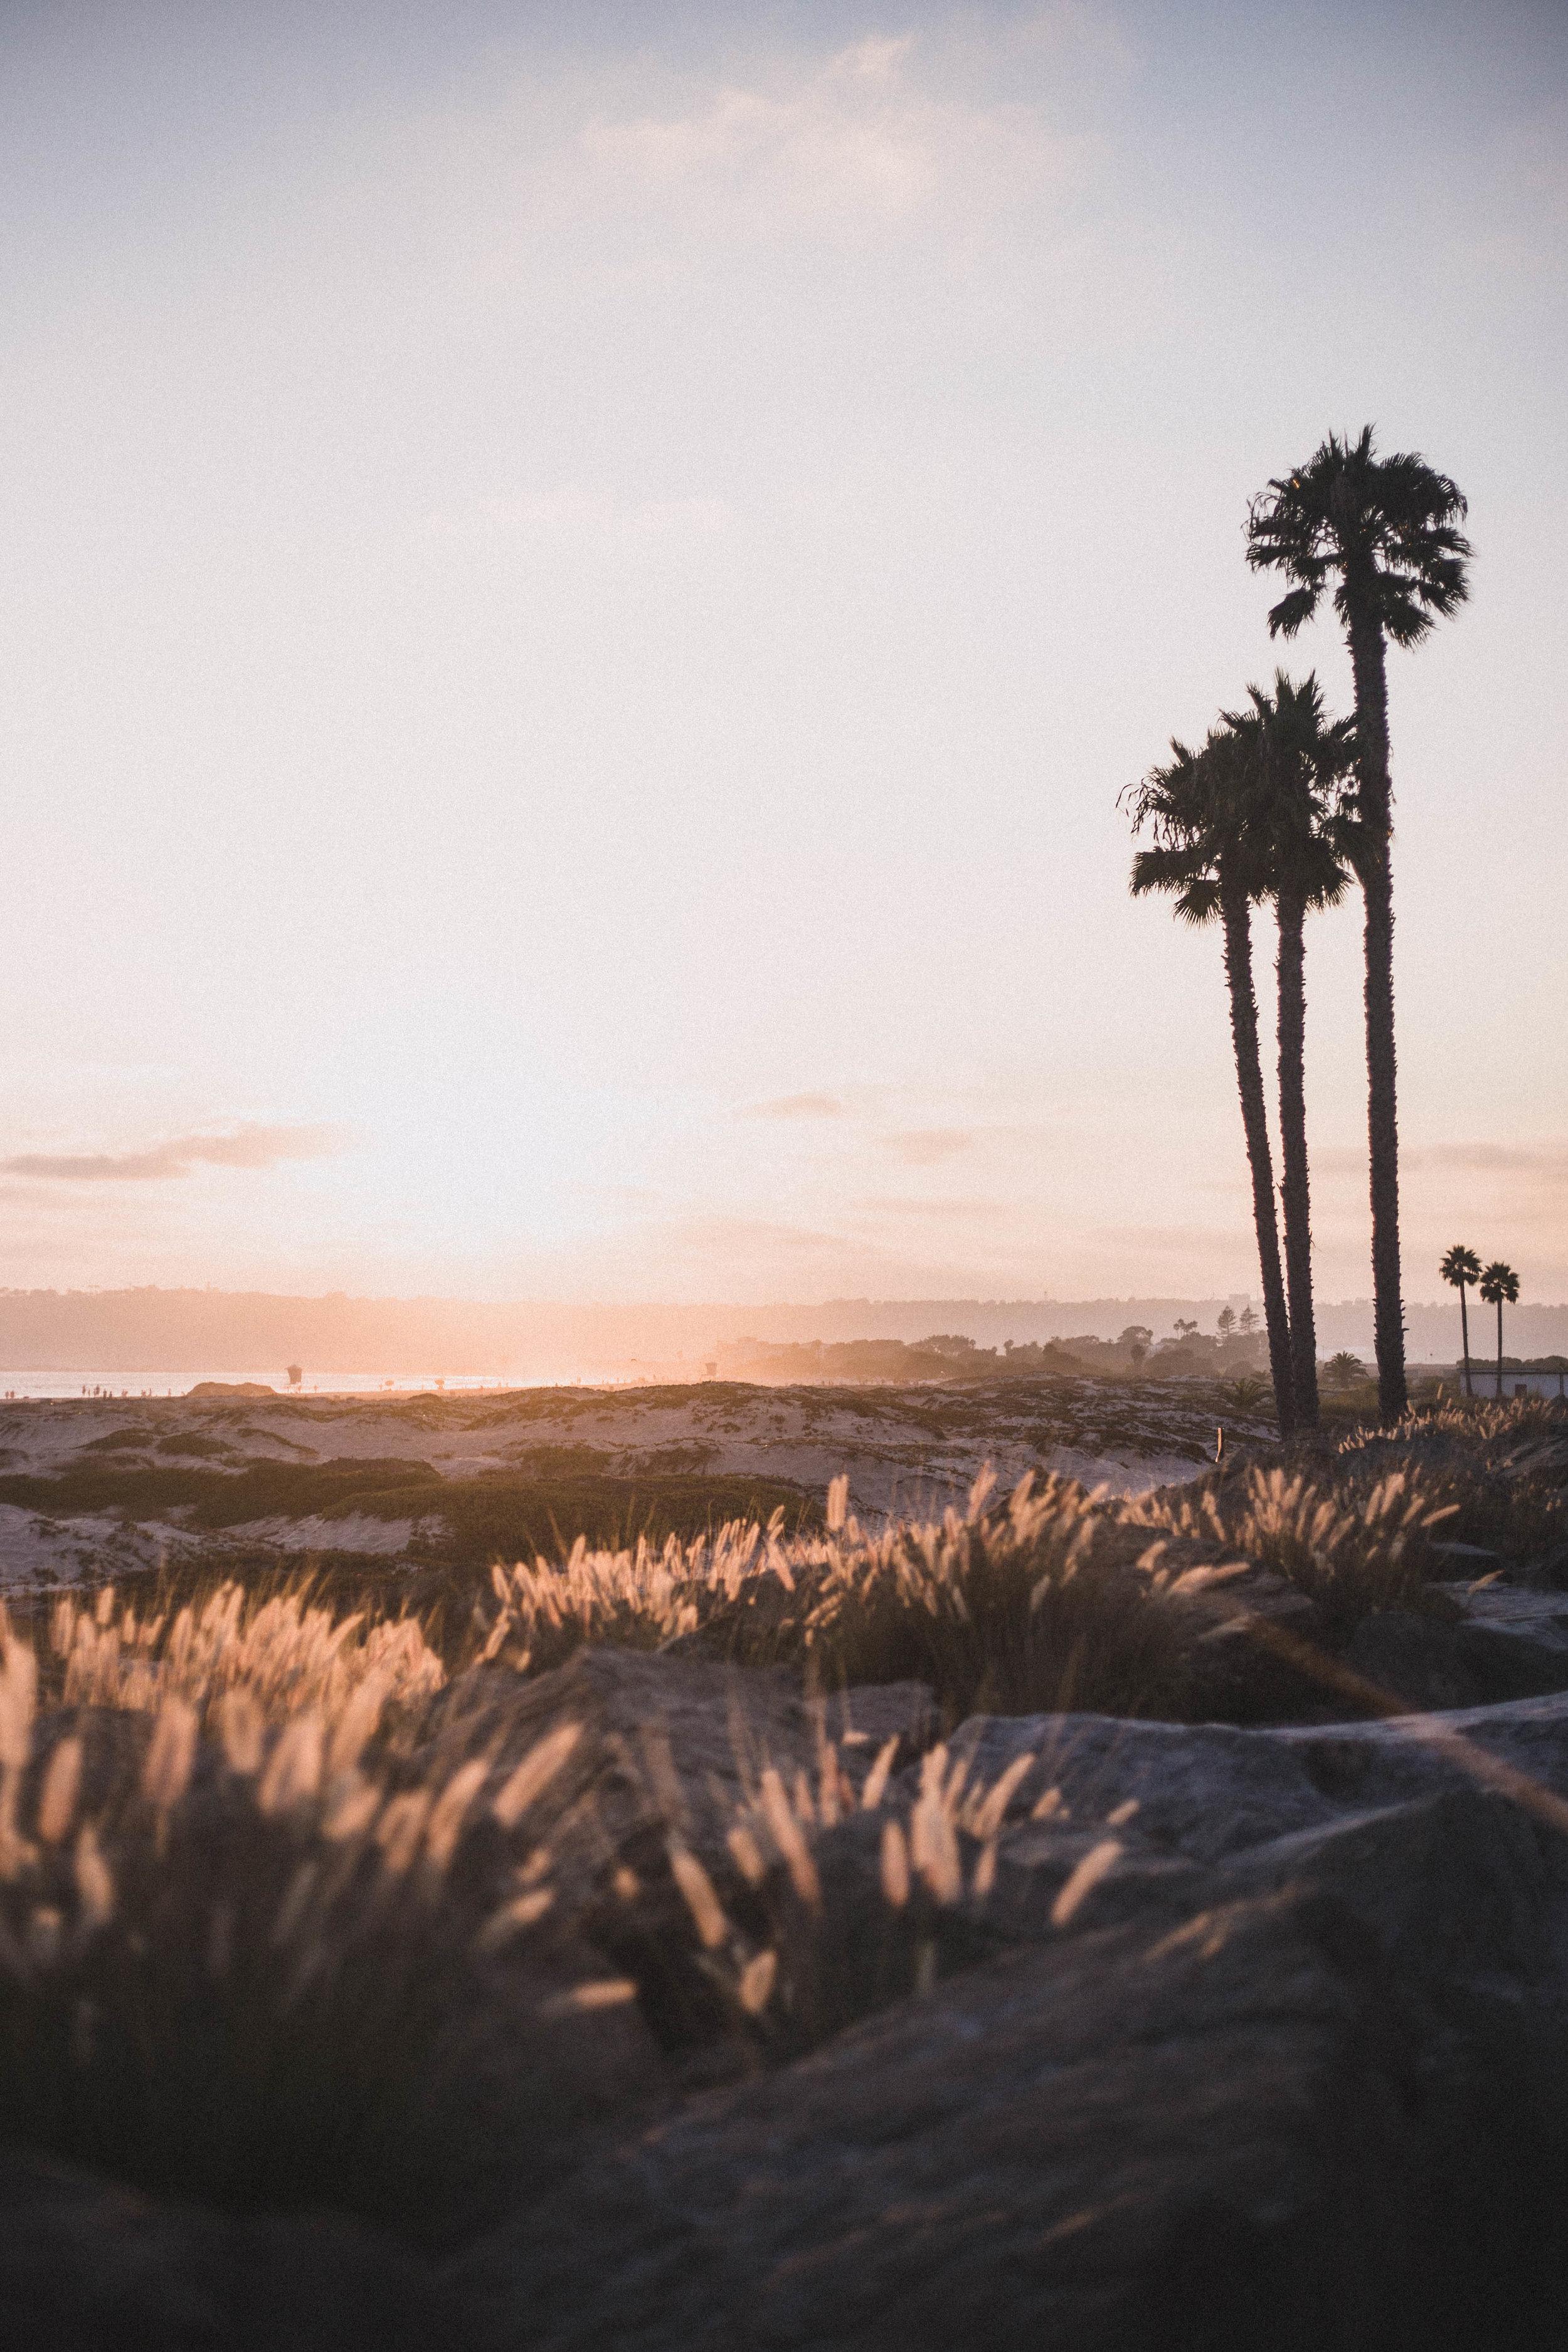 Sunset at Coronado Beach (San Diego City Guide)